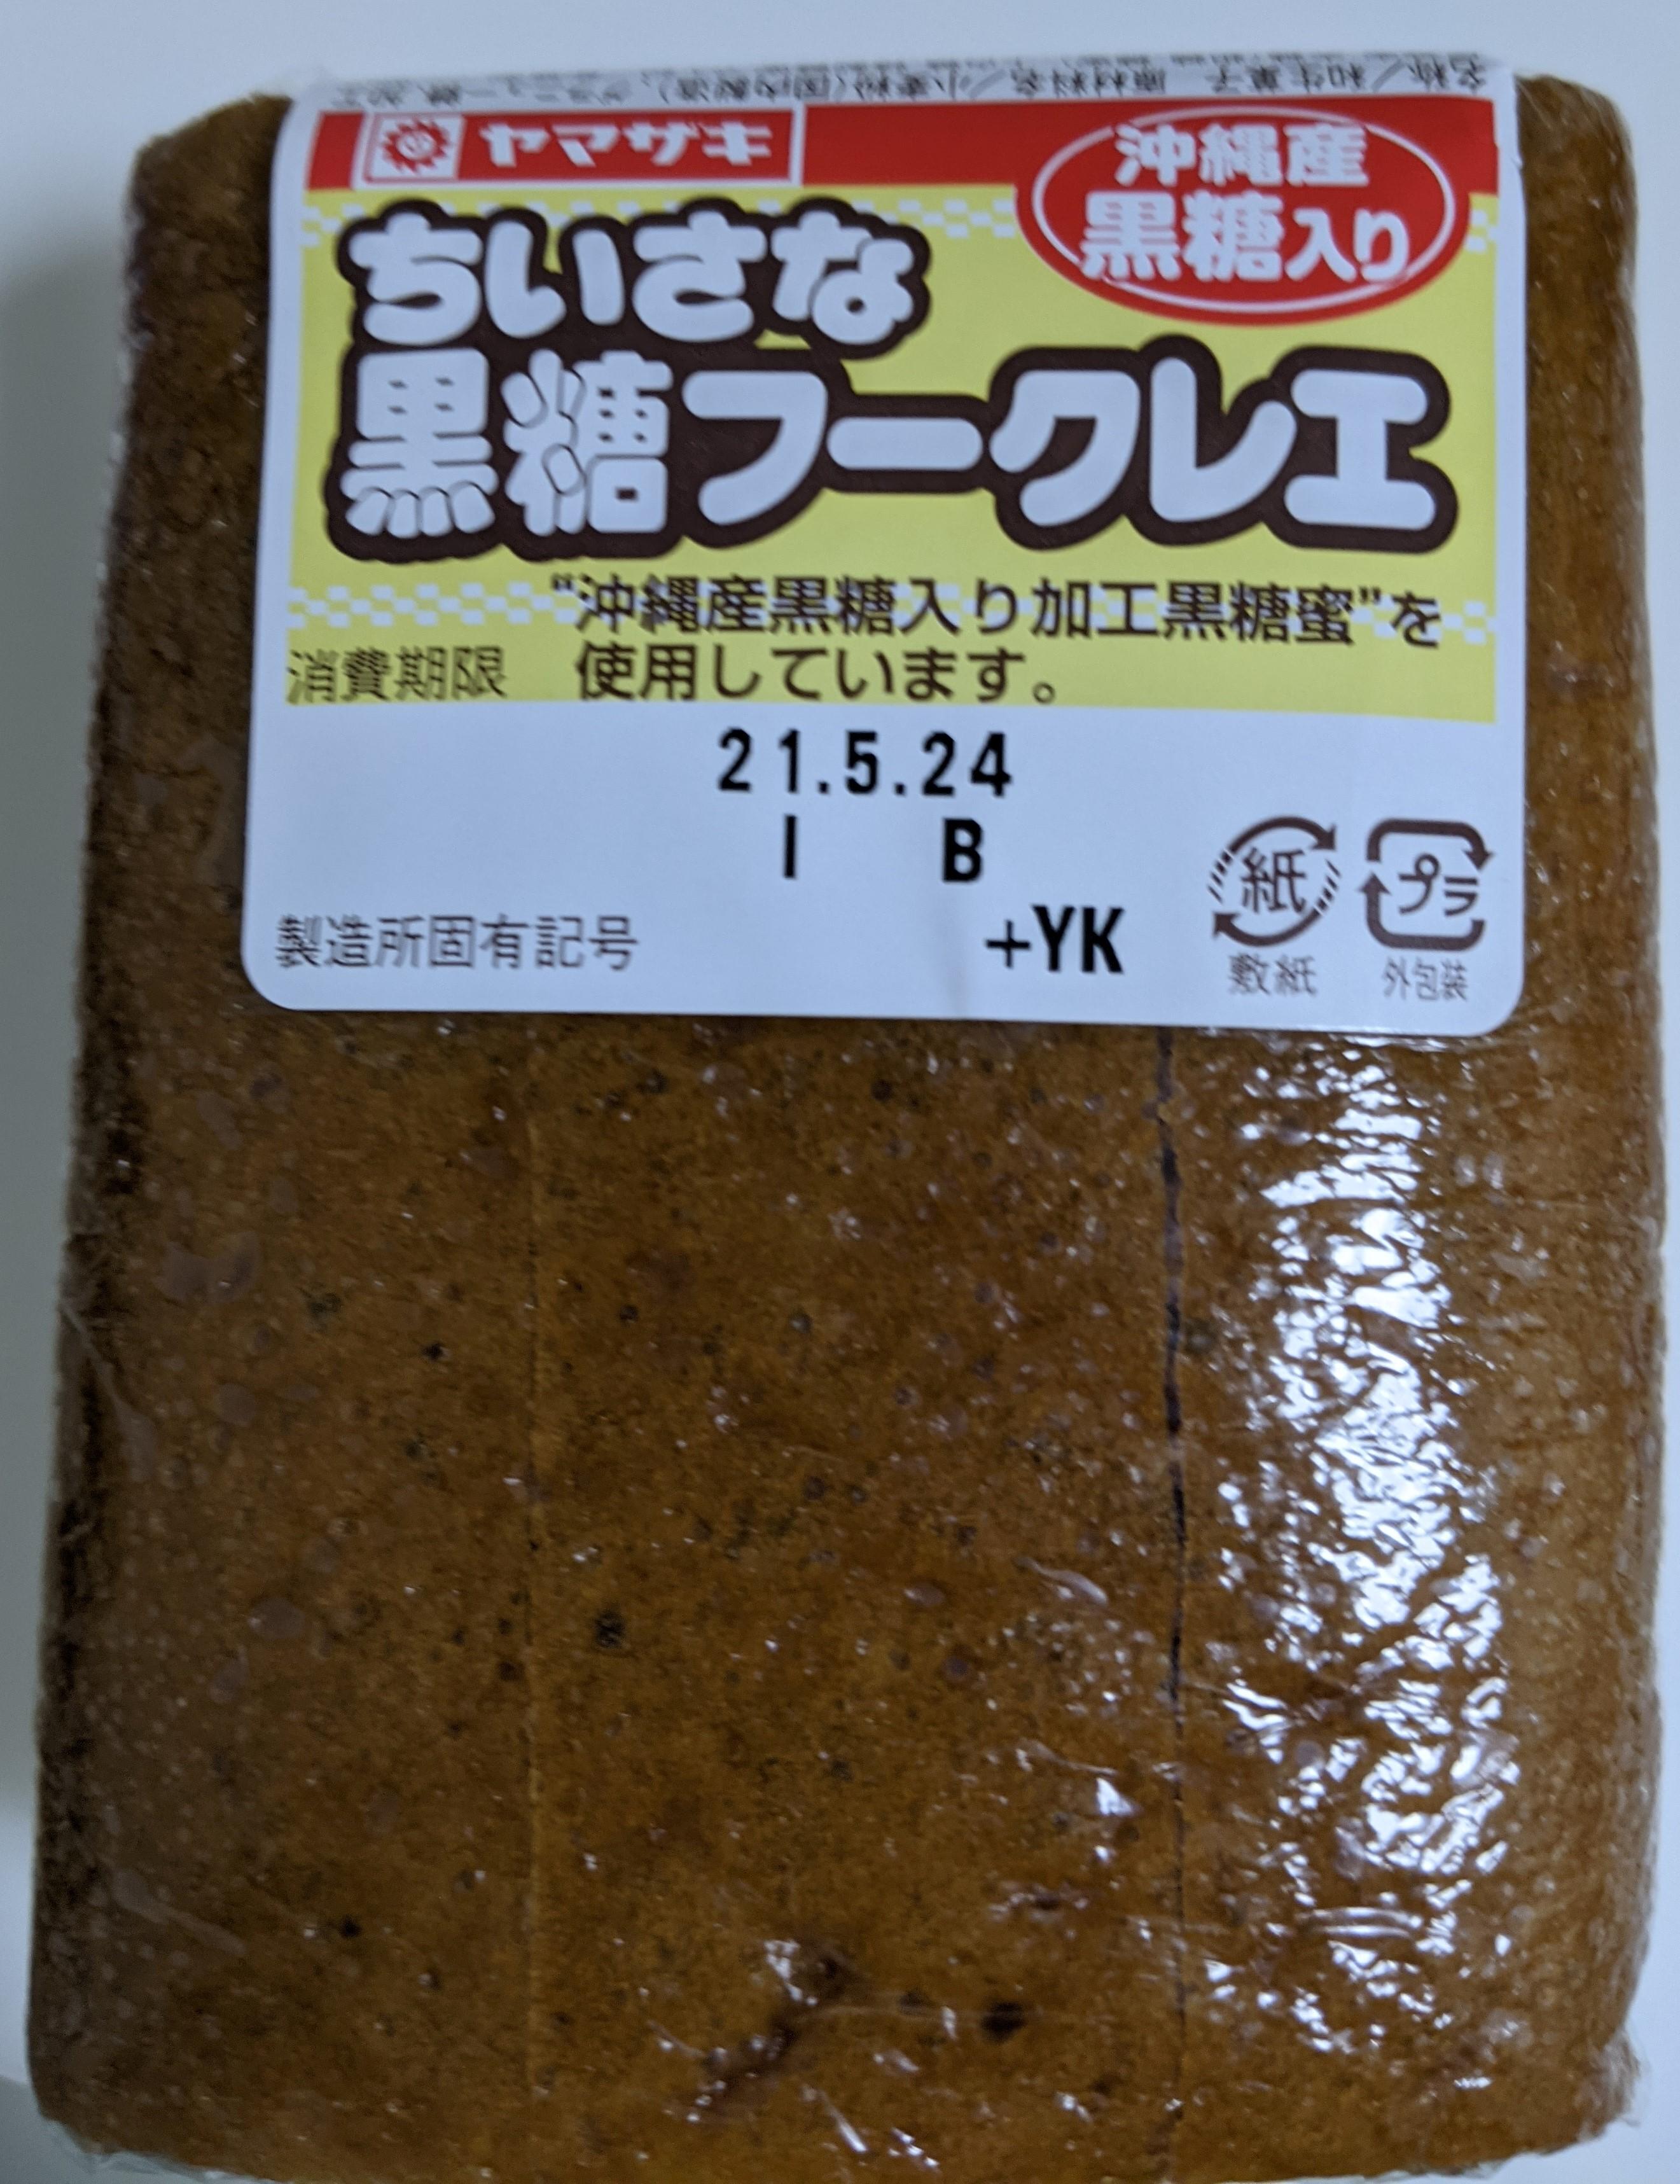 Yamazaki Small Kokuto Fukuree